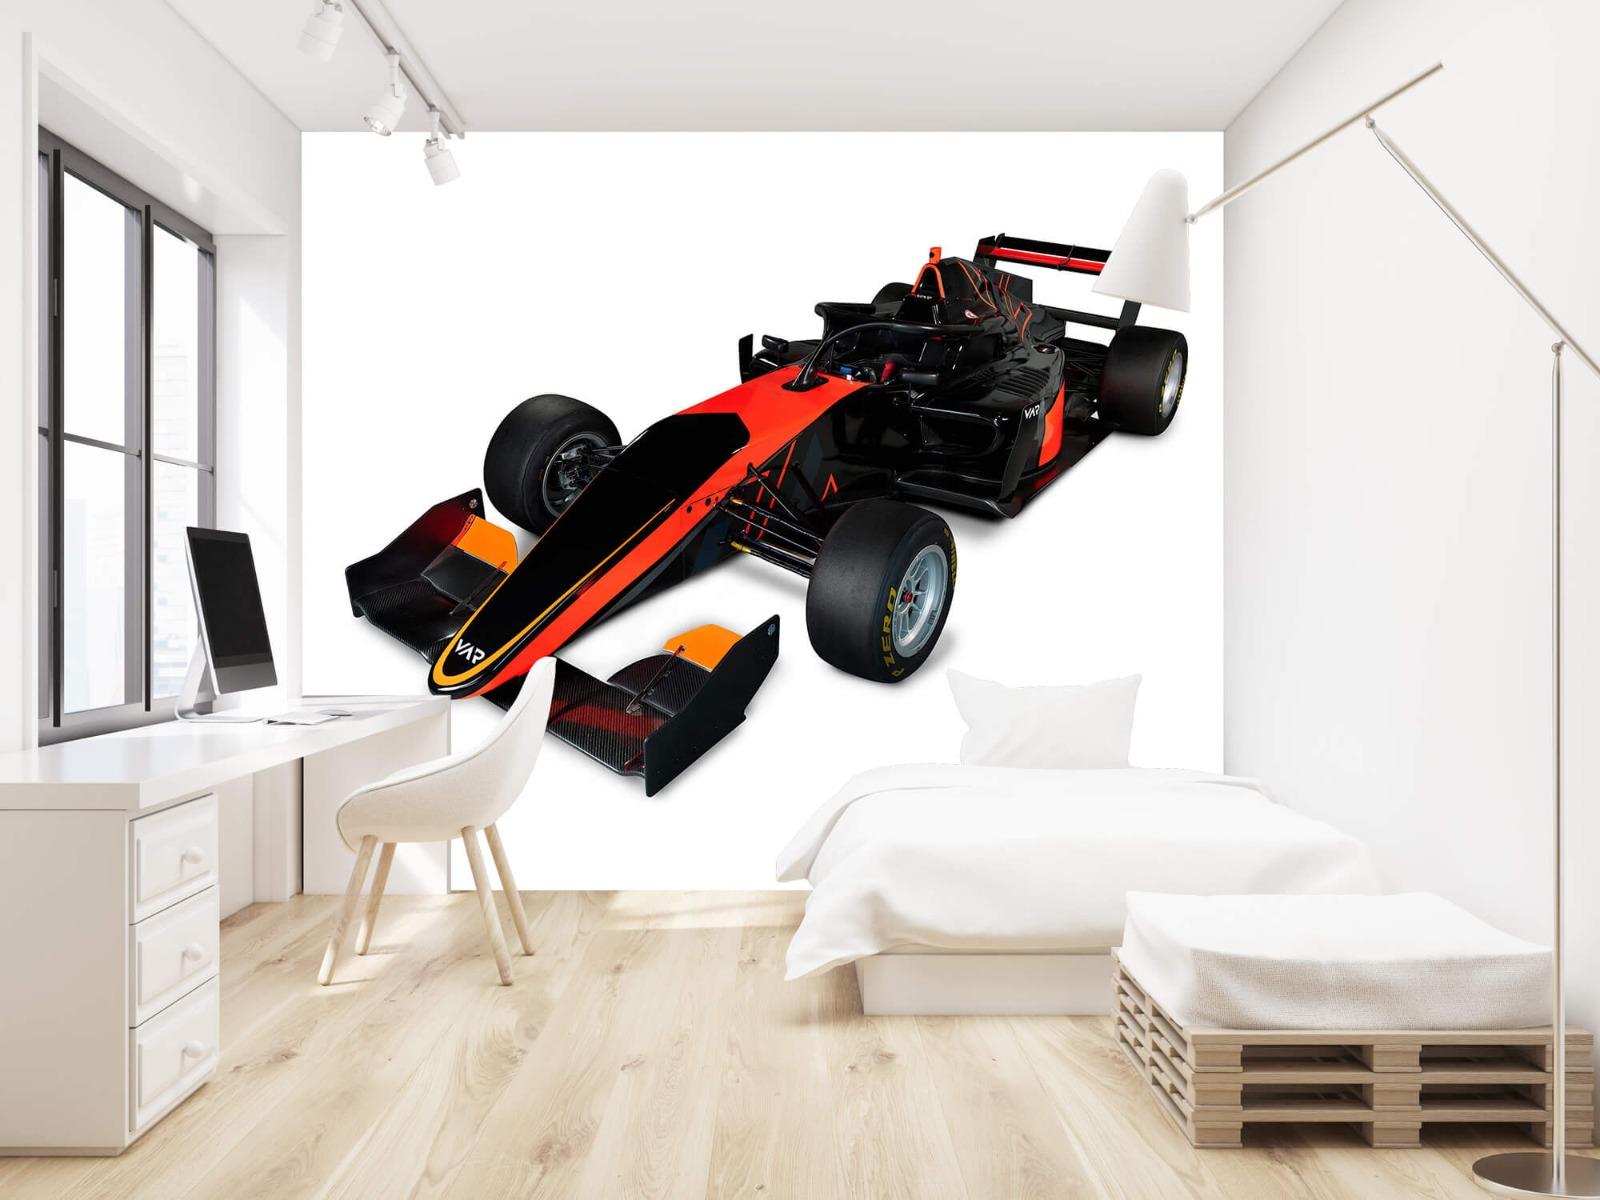 Sportauto's - Formula 3 - Left front view, 3d - Computerruimte 22